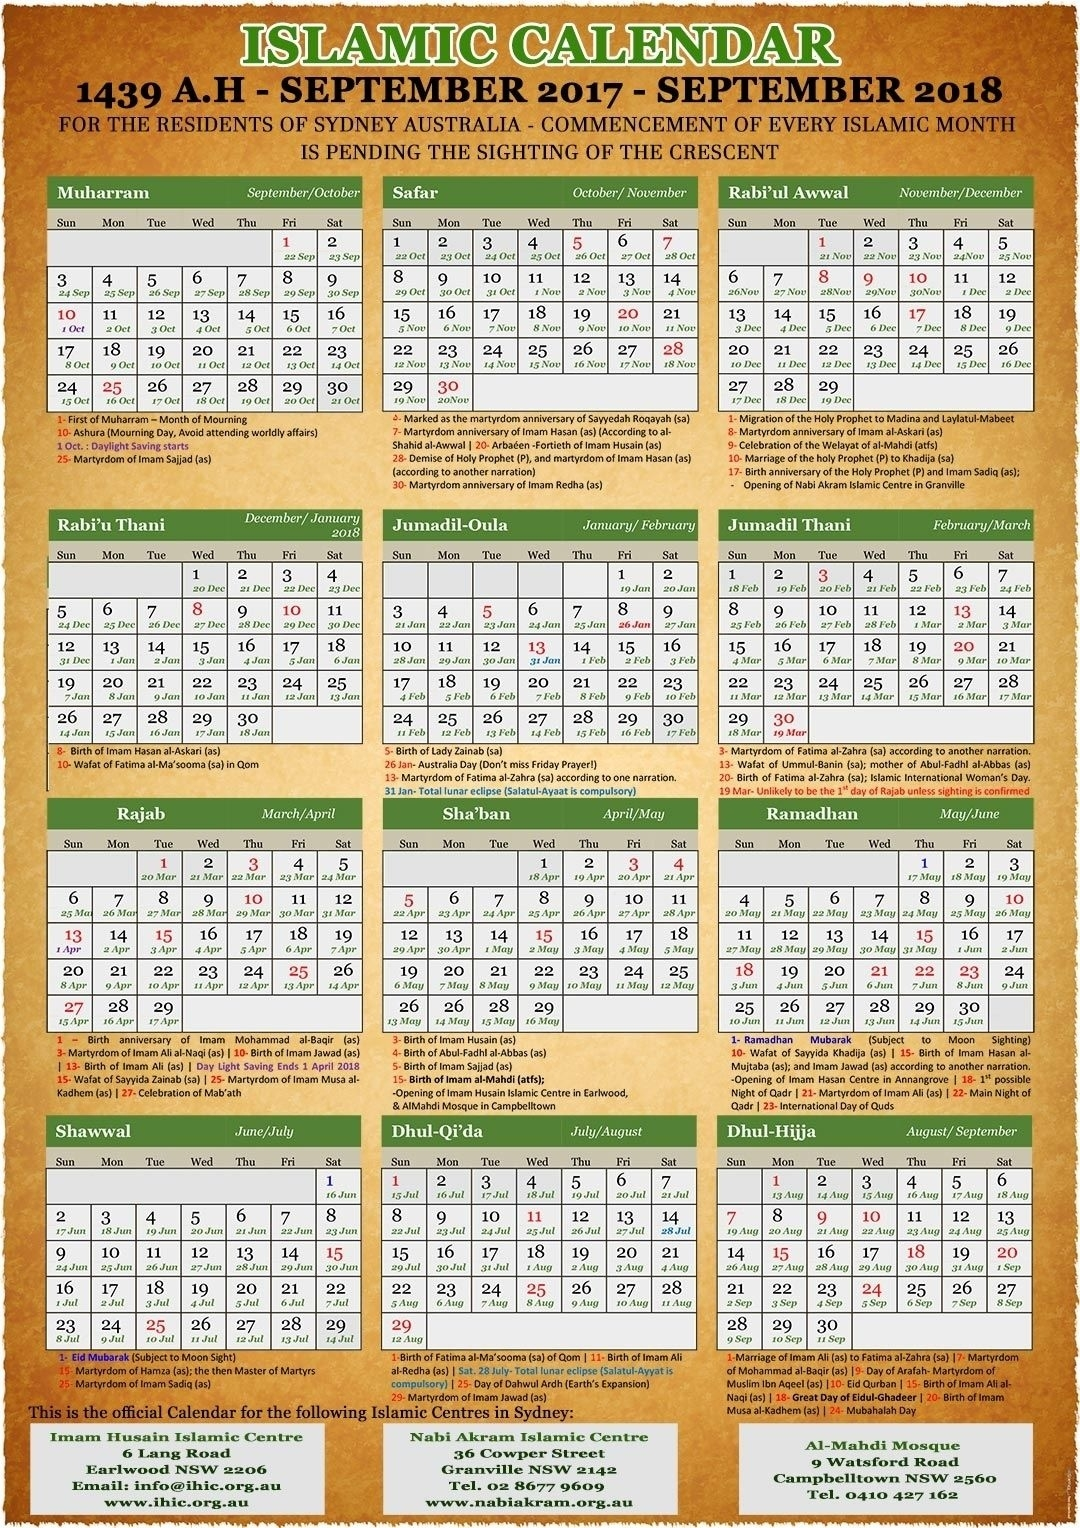 Annual Islamic Calendar 2018 (1439) - Imam Husain Islamic Centre Free | Hijri Calendar, Islamic 25 June 2021 Islamic Calendar